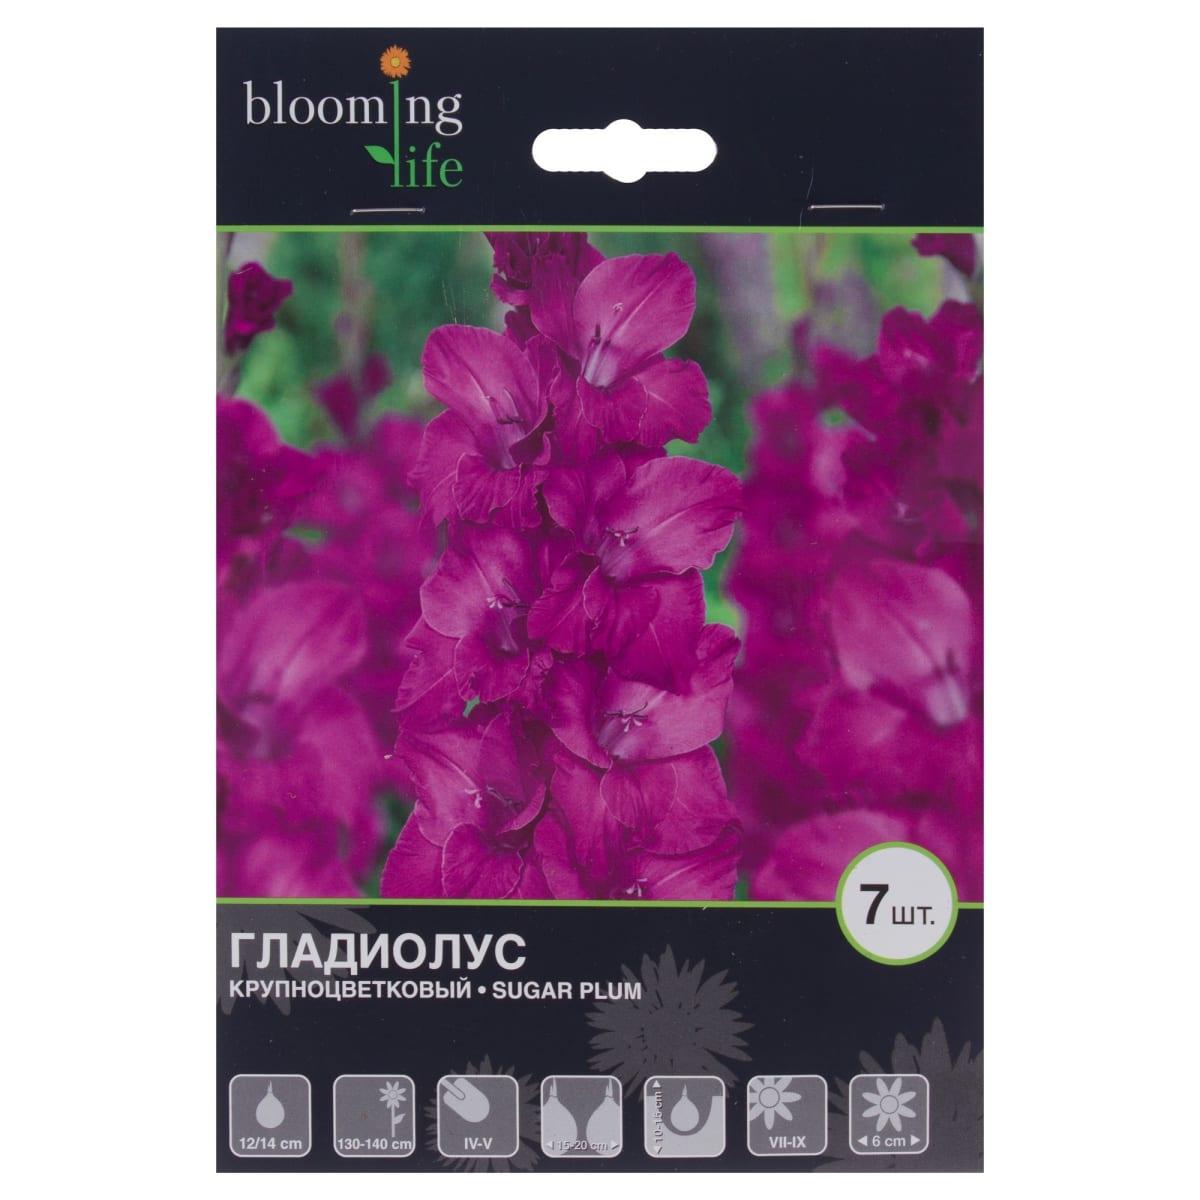 Гладиолус крупноцветковый «Шуга Плум»